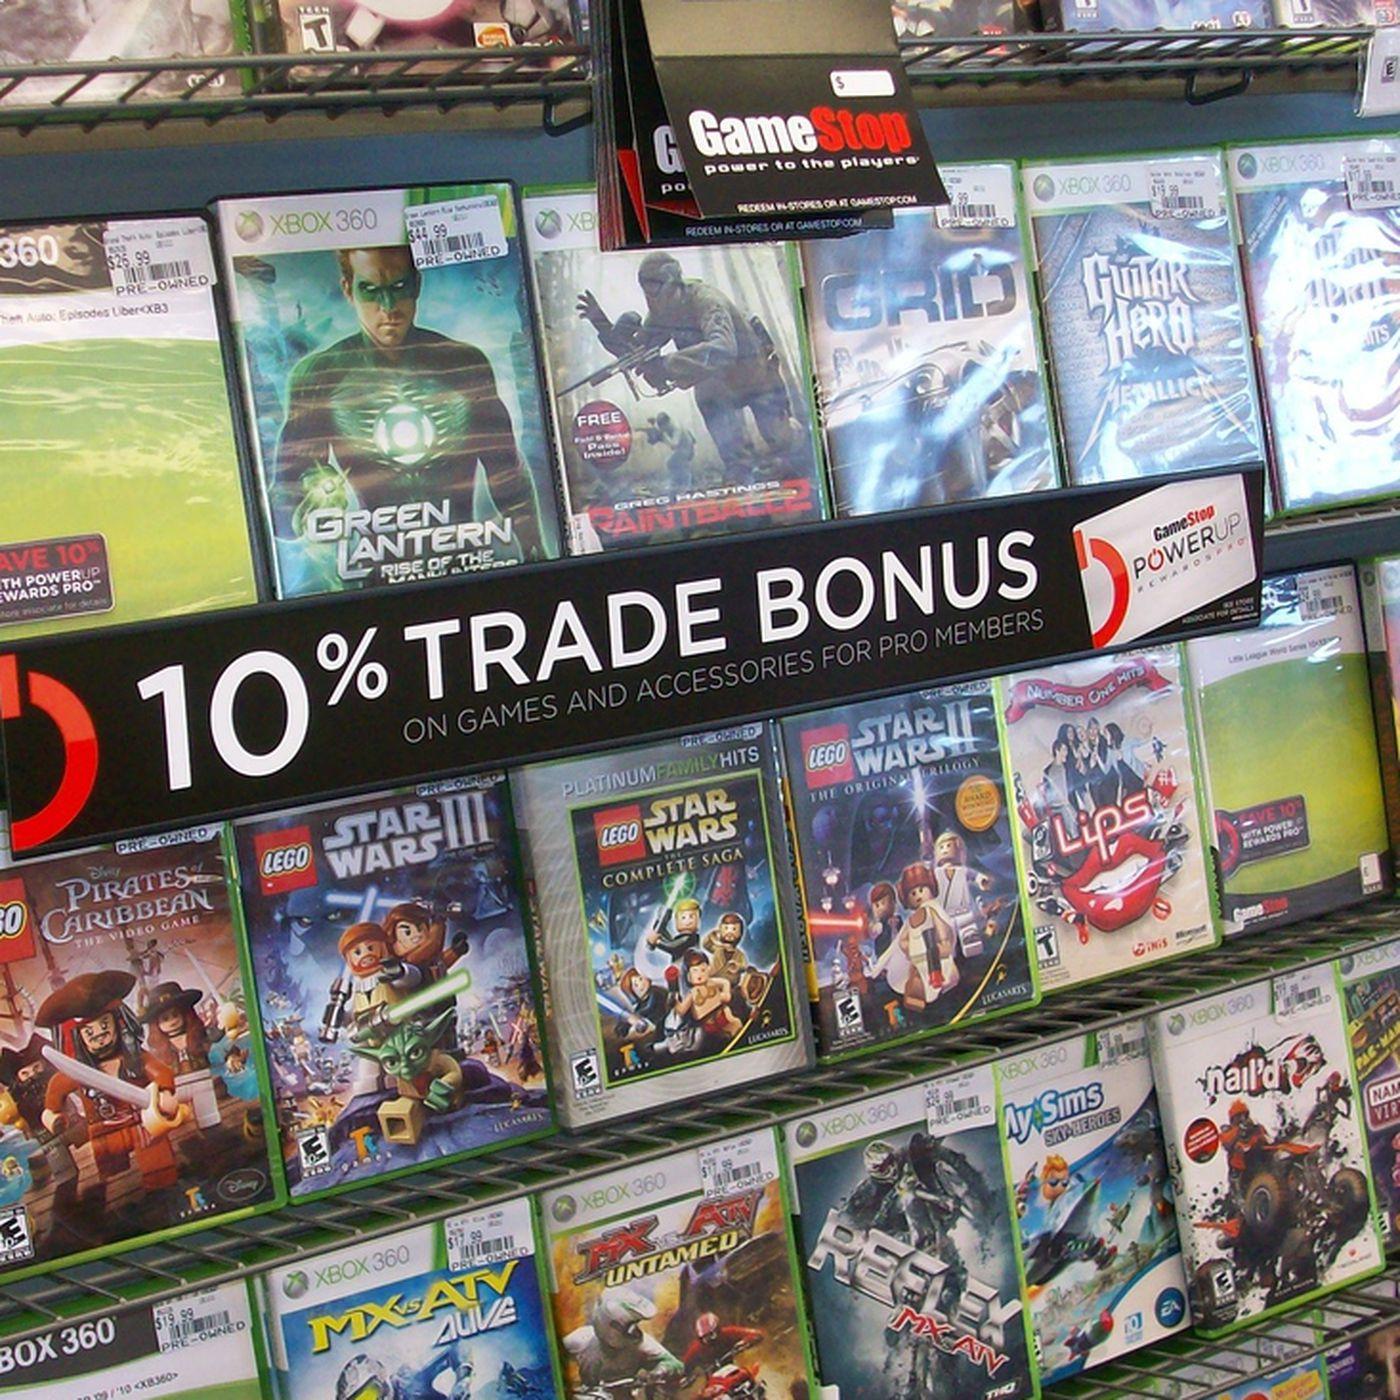 GameStop attributes fourth-quarter 2013 sales increase to